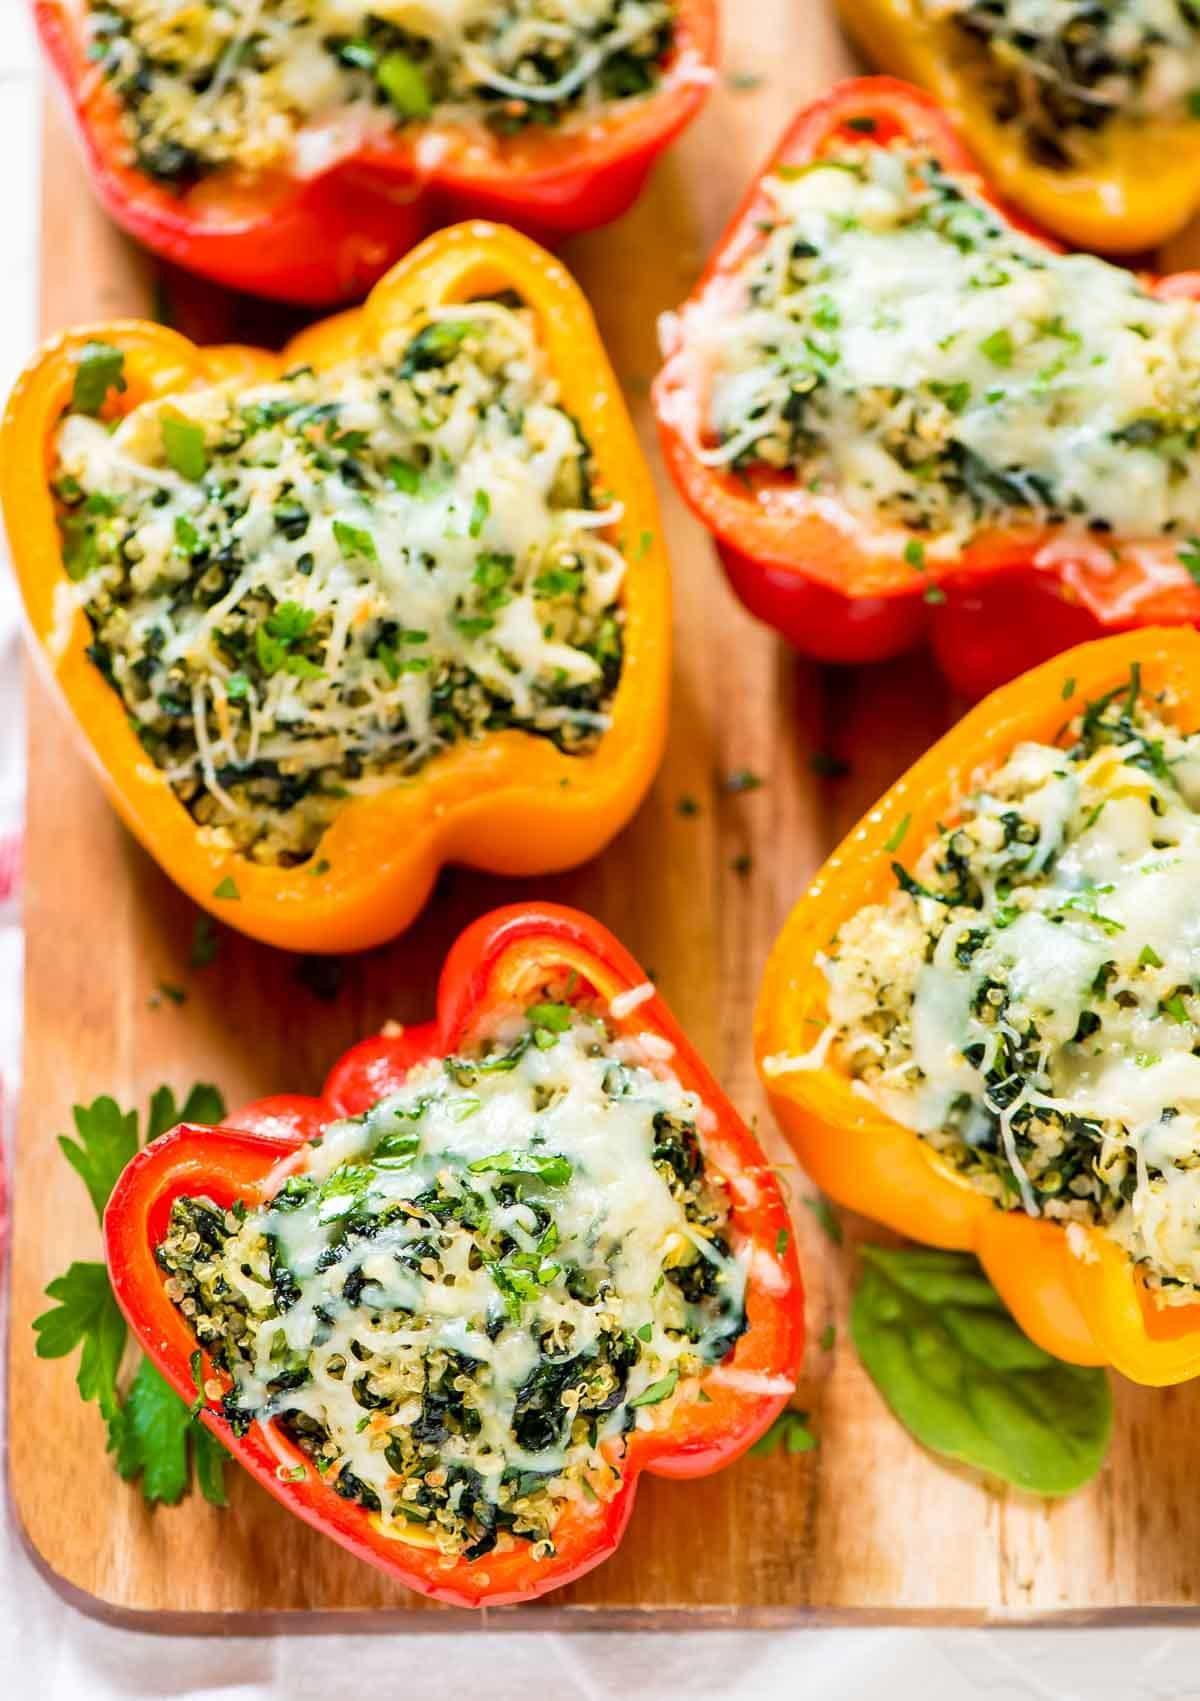 Stuffed Bell Peppers Healthy  Spinach Artichoke Quinoa Stuffed Bell Peppers